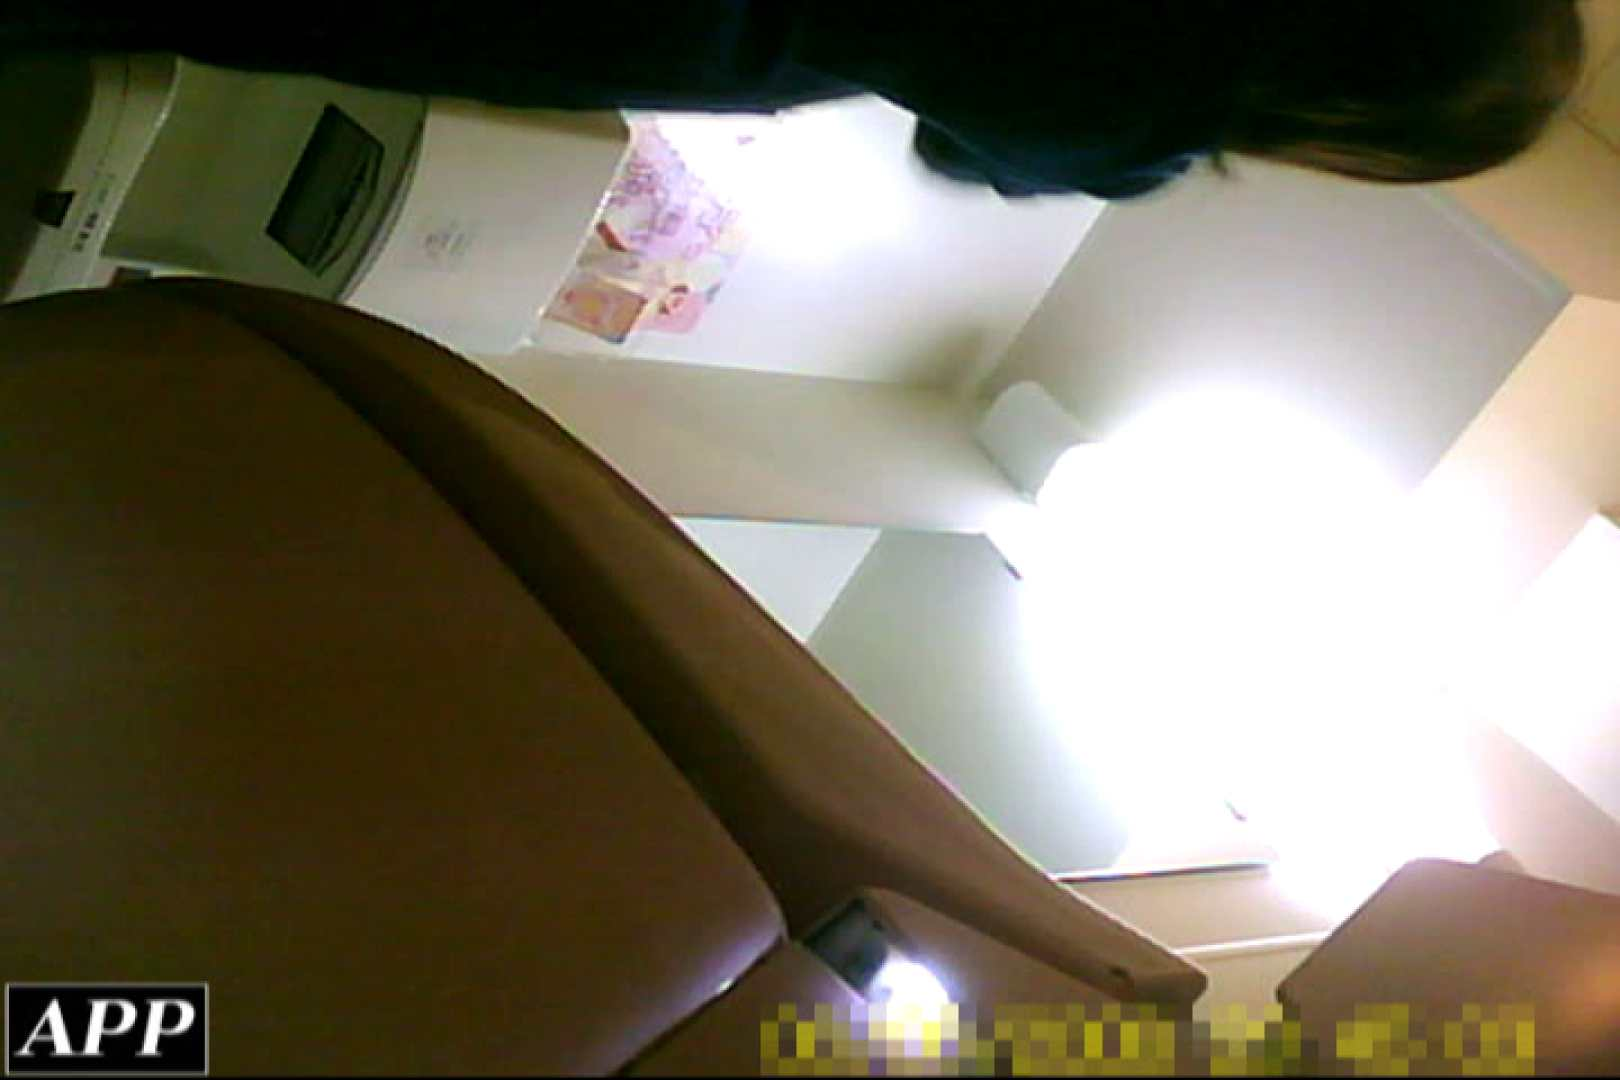 3視点洗面所 vol.61 女体盗撮 覗きワレメ動画紹介 91連発 81